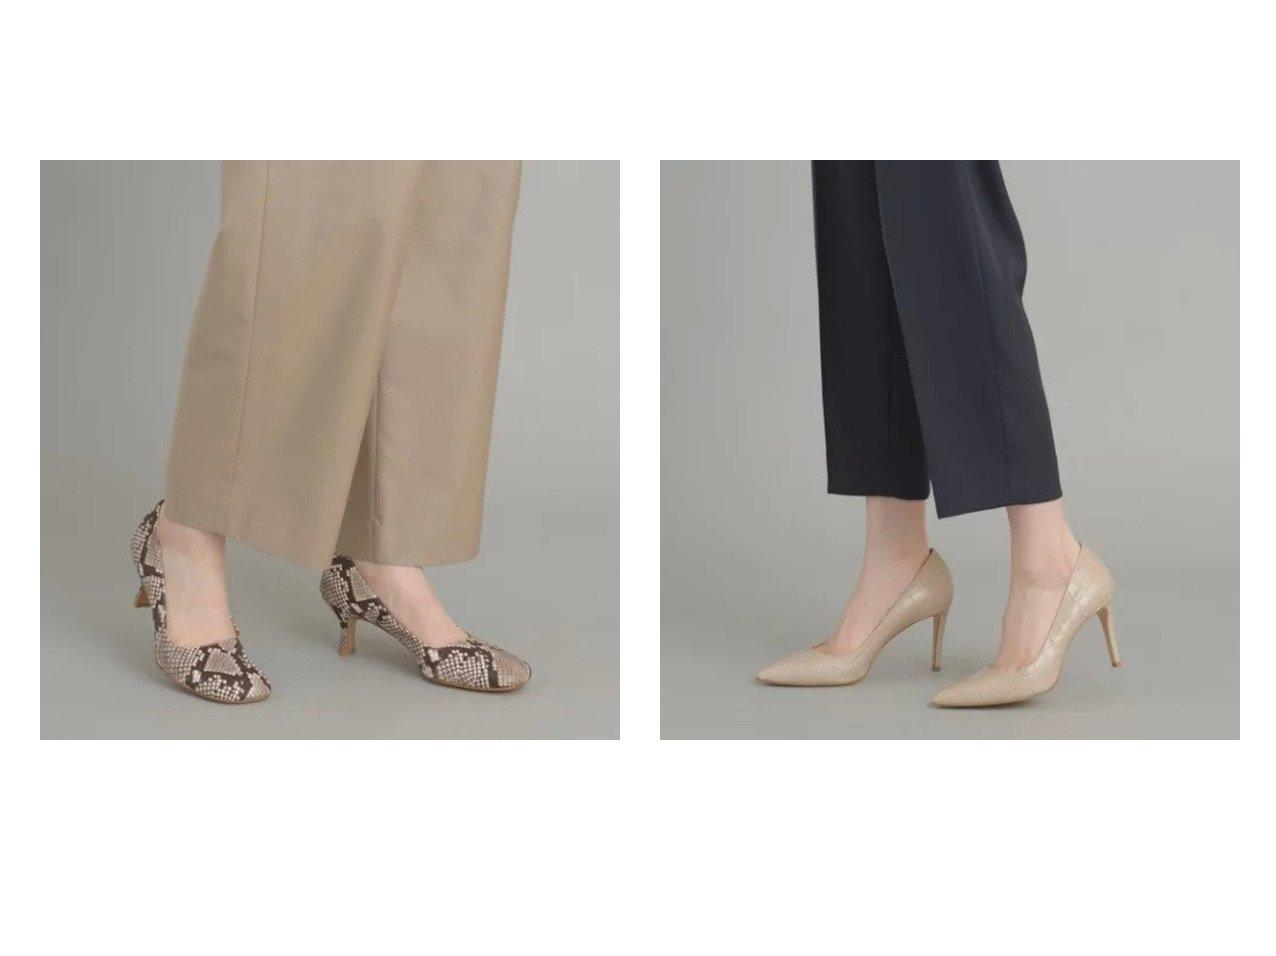 【Odette e Odile/オデット エ オディール】のOID オブリークトゥ パンプス60&OID ポインテッドプレーン パンプス85↓↑ オデット エ オディールのおすすめ!人気、トレンド・レディースファッションの通販 おすすめで人気の流行・トレンド、ファッションの通販商品 メンズファッション・キッズファッション・インテリア・家具・レディースファッション・服の通販 founy(ファニー) https://founy.com/ ファッション Fashion レディースファッション WOMEN エレガント シューズ シンプル フォルム スクエア パイソン  ID:crp329100000021941